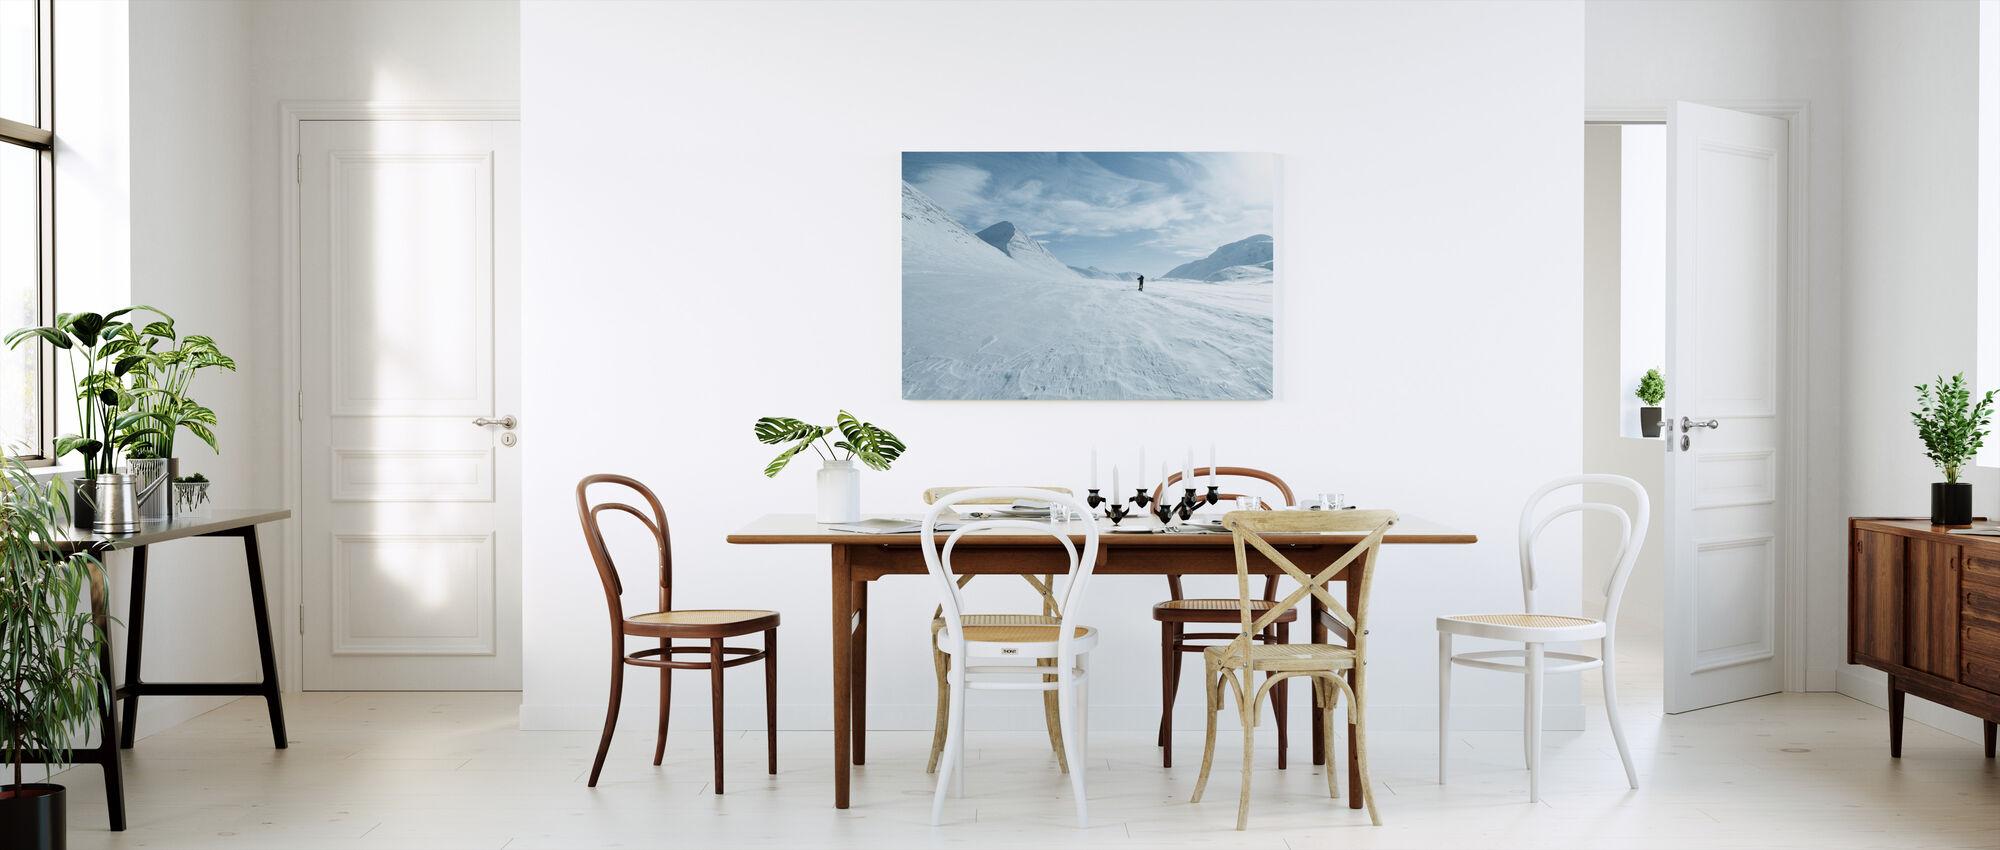 One Man Only - Canvas print - Kitchen